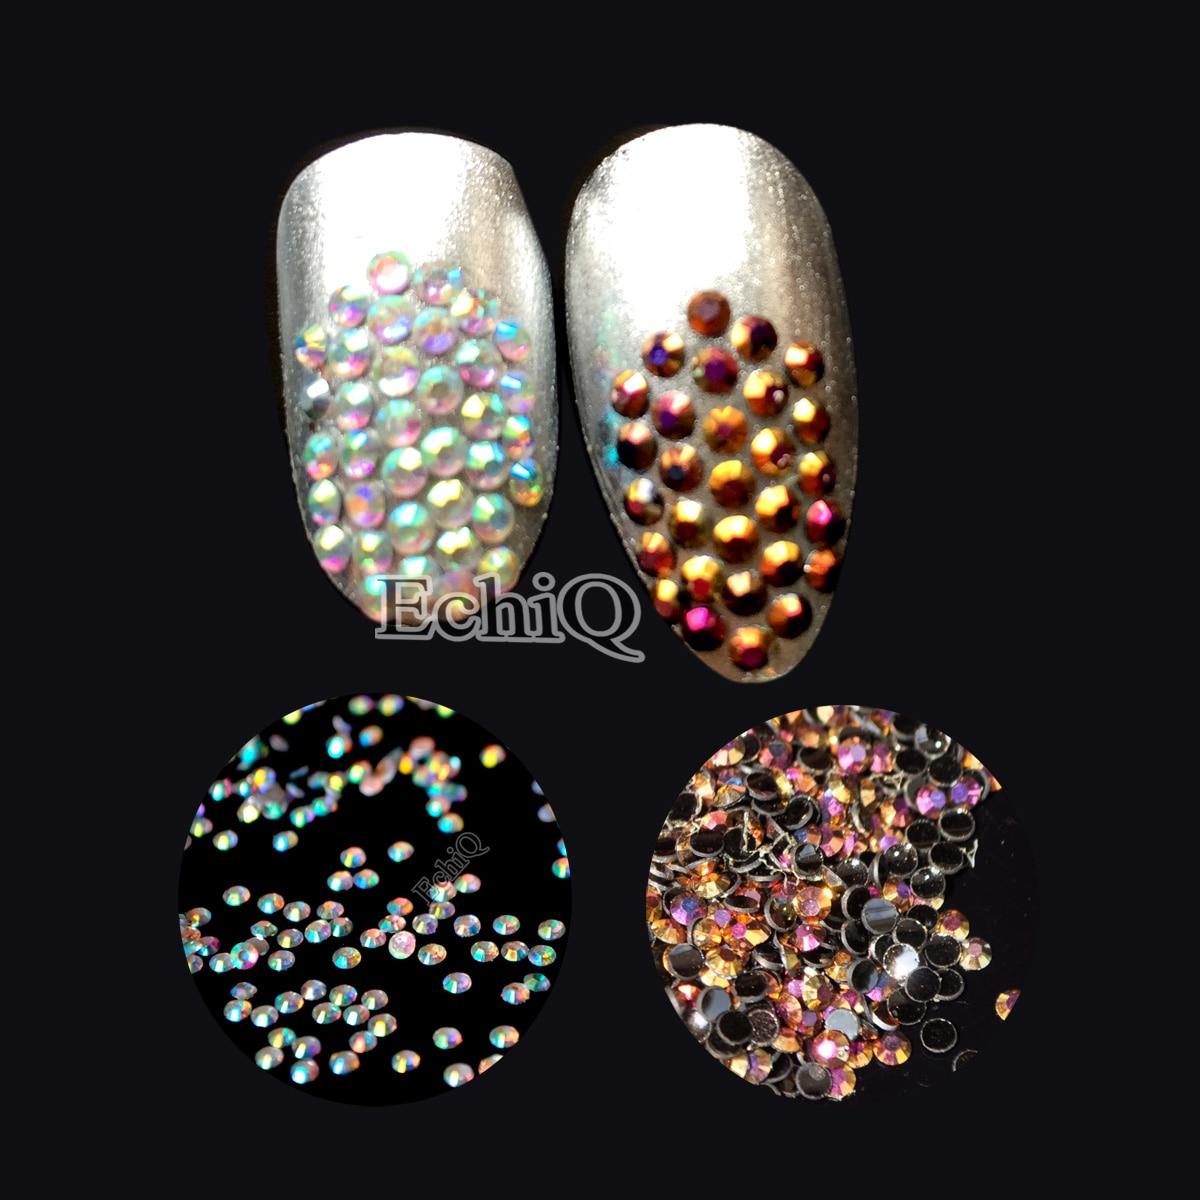 1000pcs ss6 2mm Sizes AB Rhinestone Stones Nail Art Crystal Resin Flatback Rhinestone Beads No Hotfix For Clothes Decoration декаль waffen ss uniform insignia part no 2 nordland division